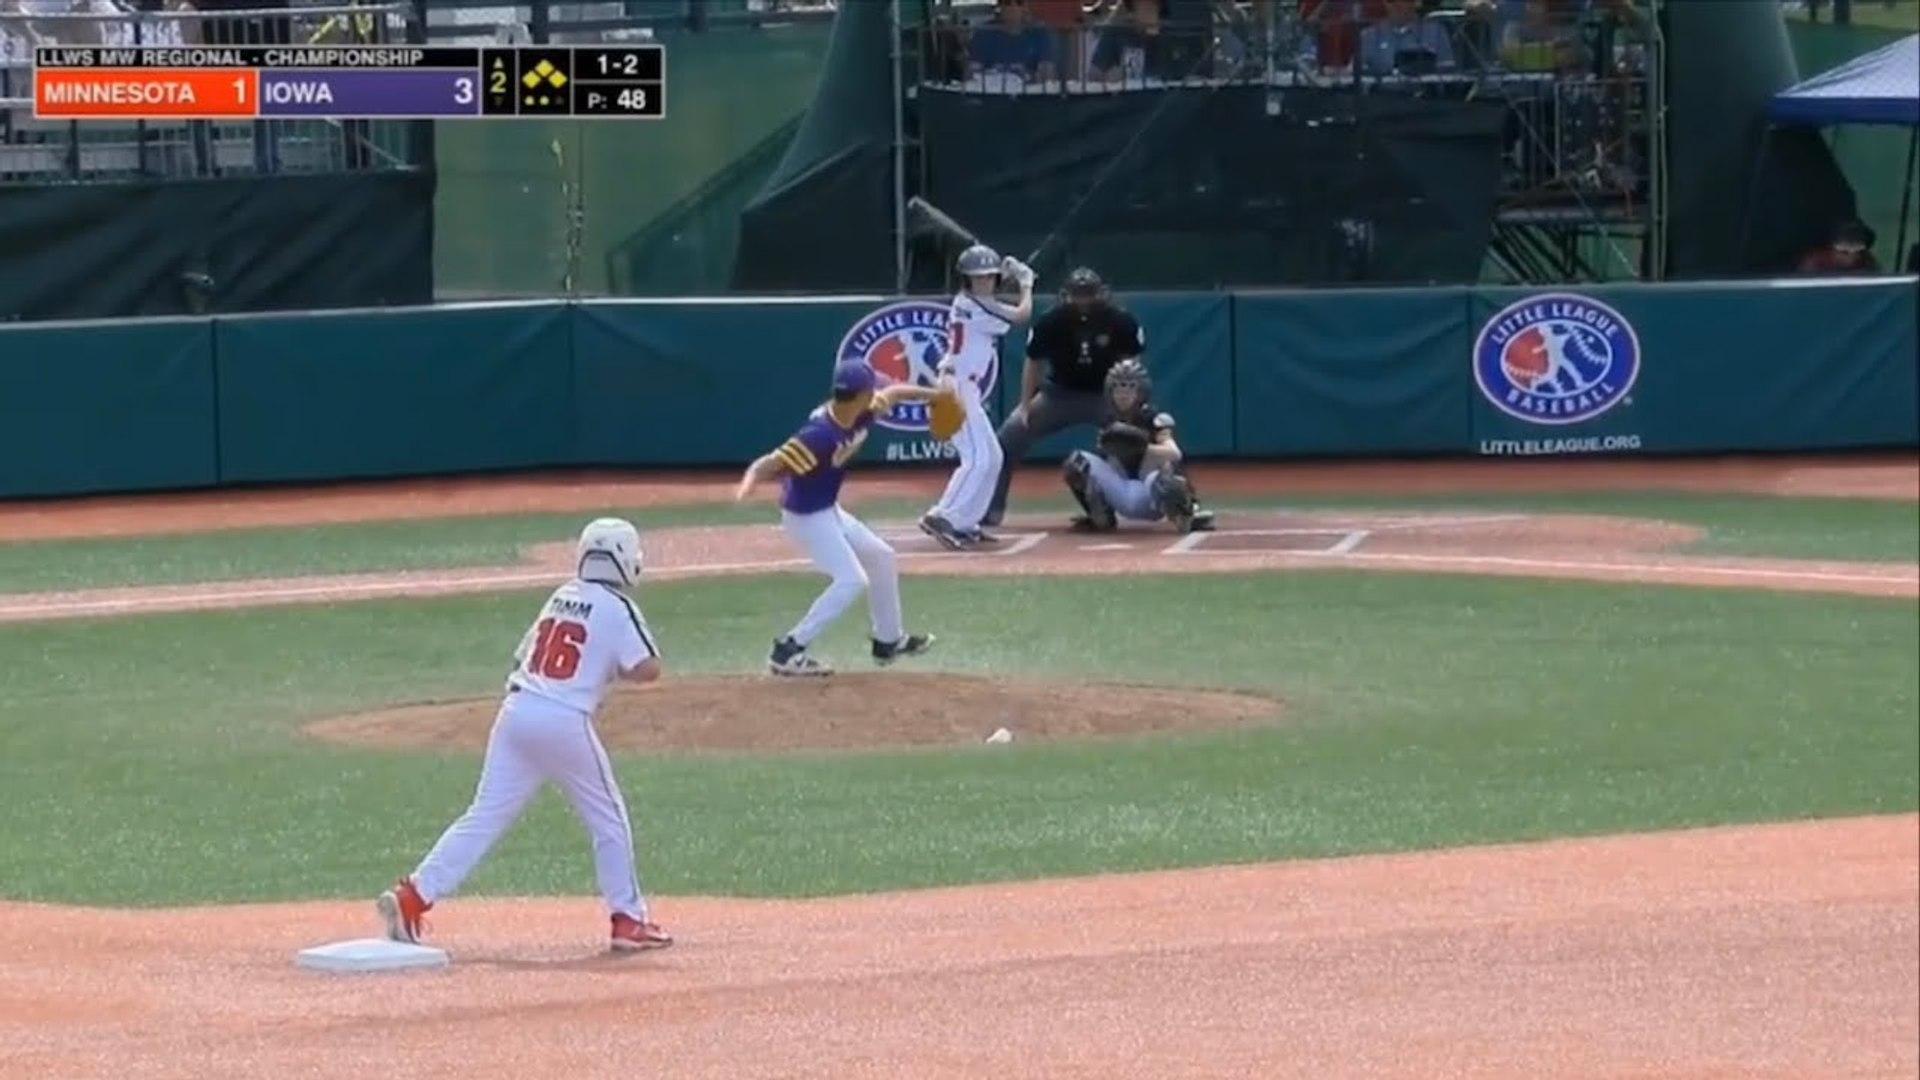 LLWS 2019 Midwest Region Championship Game _ Minnesota vs Iowa _ 2019 Little League World Series